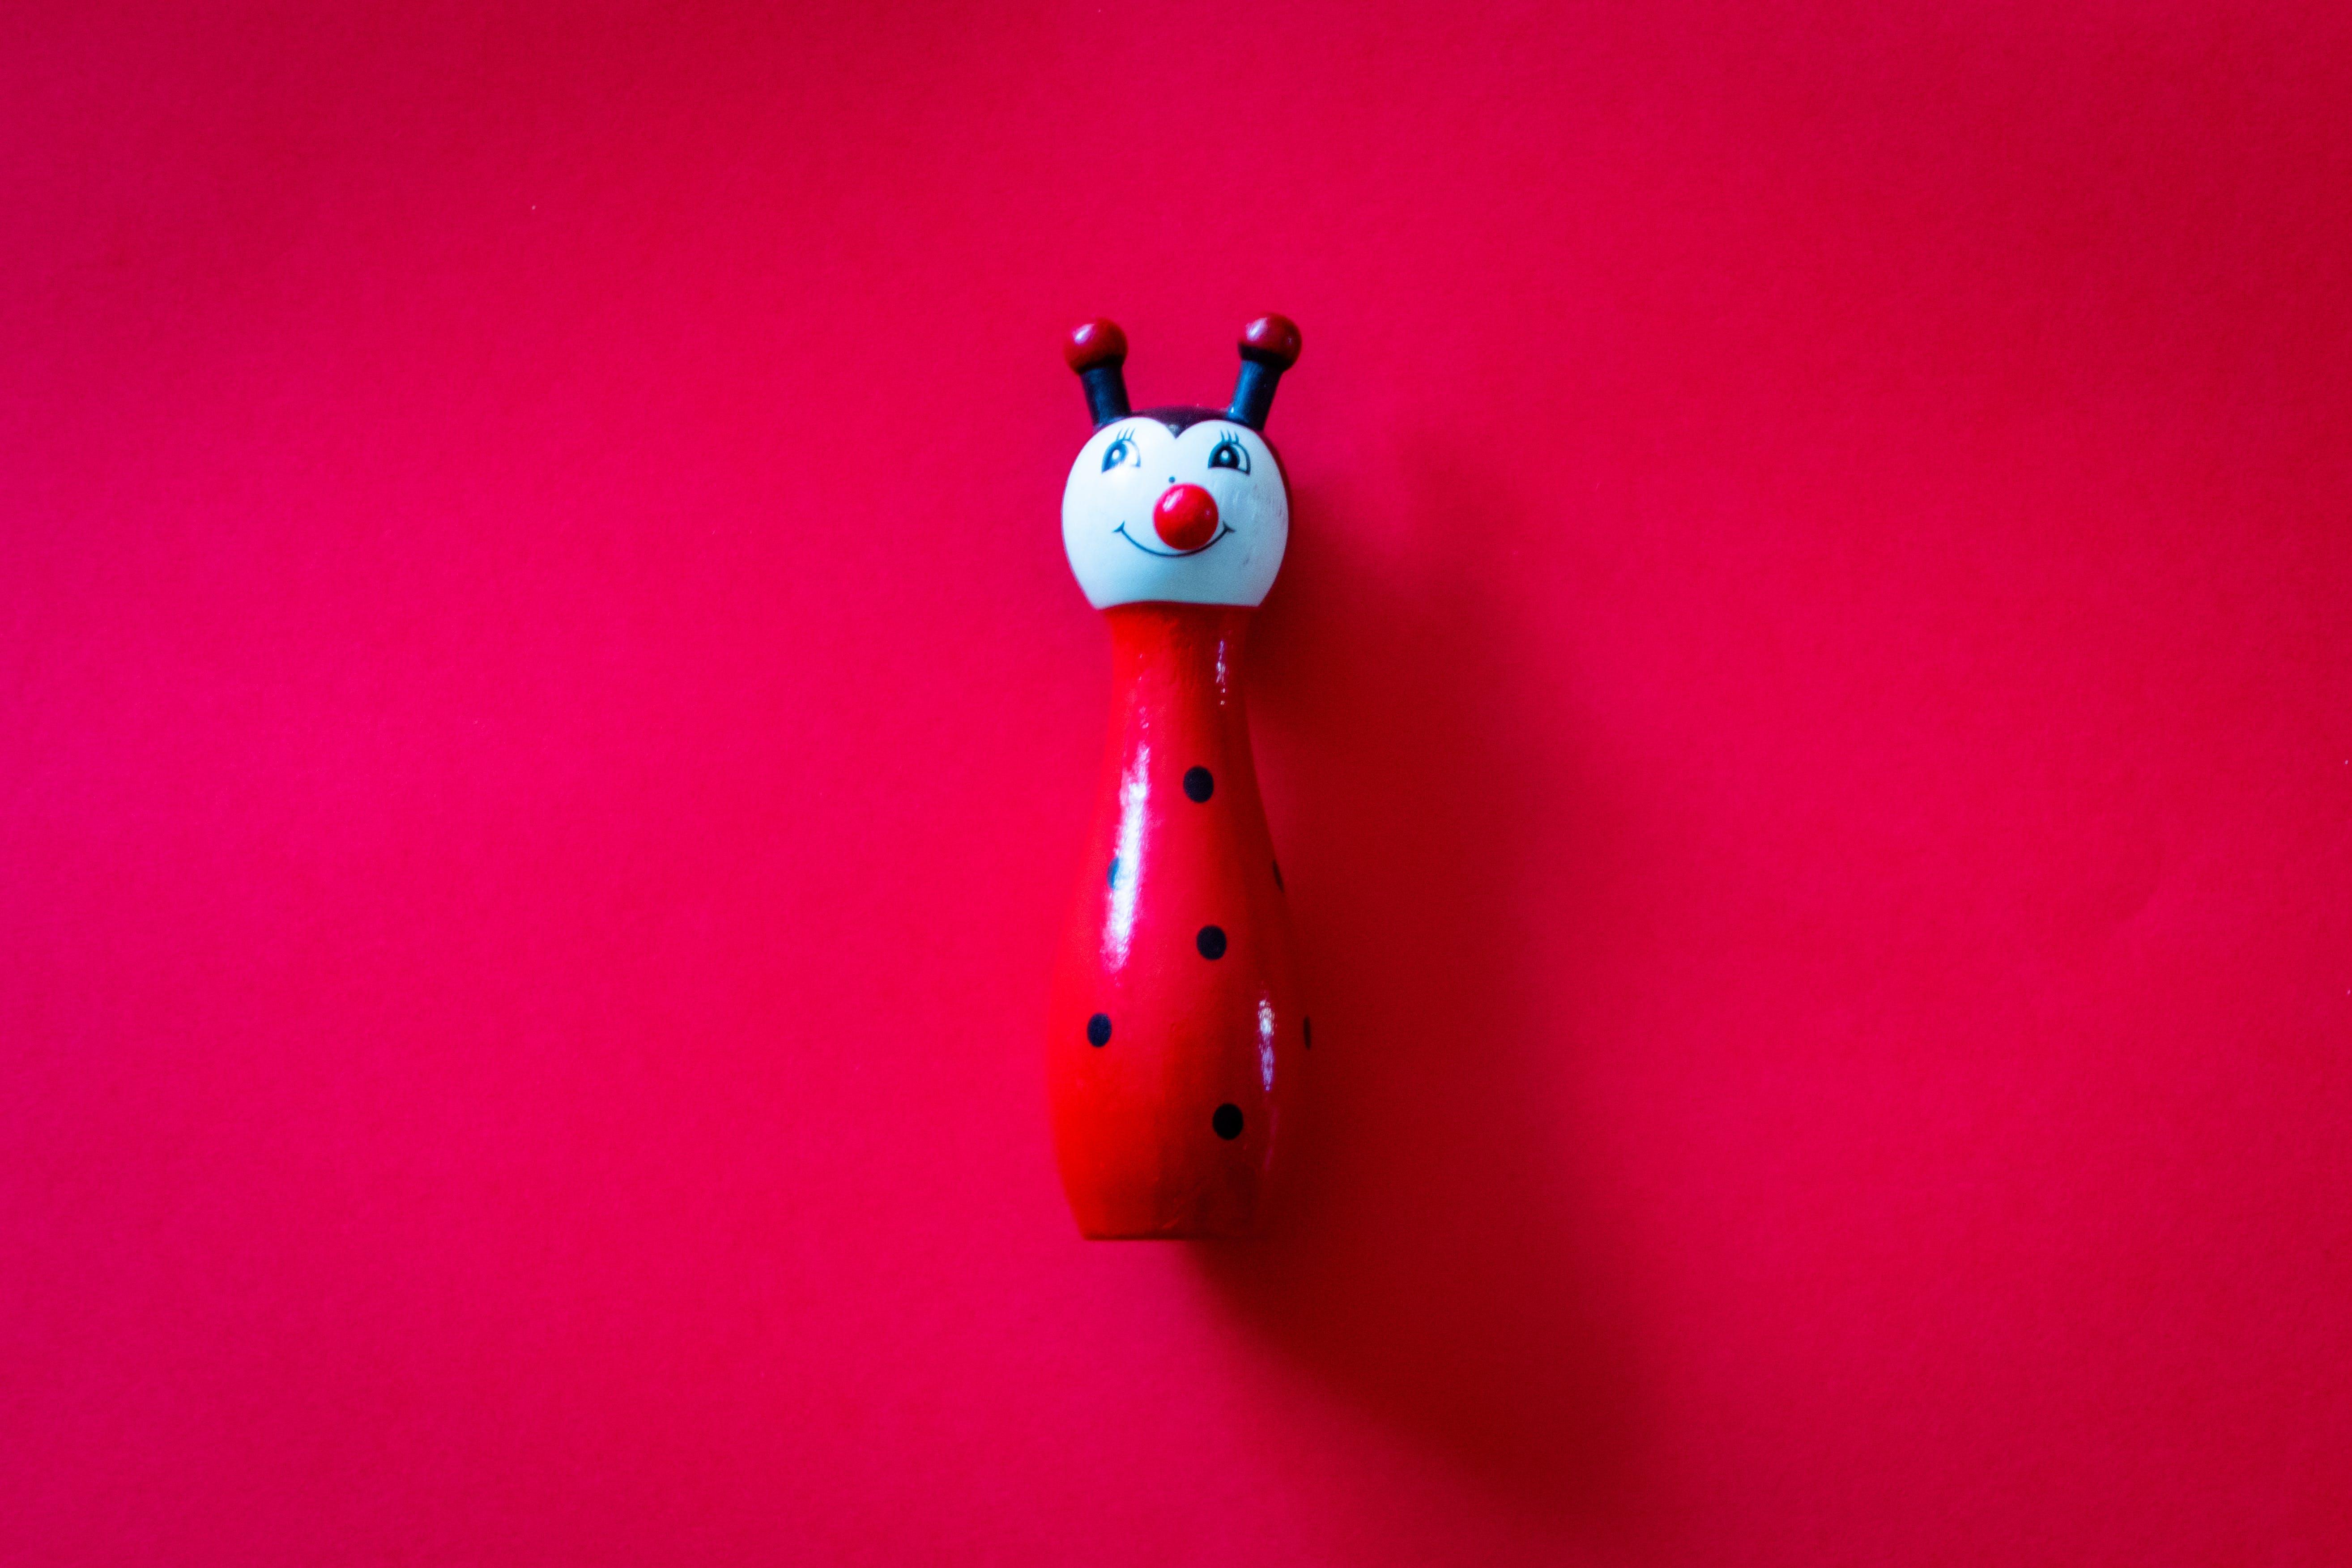 Red and Blue Ceramic Figurine